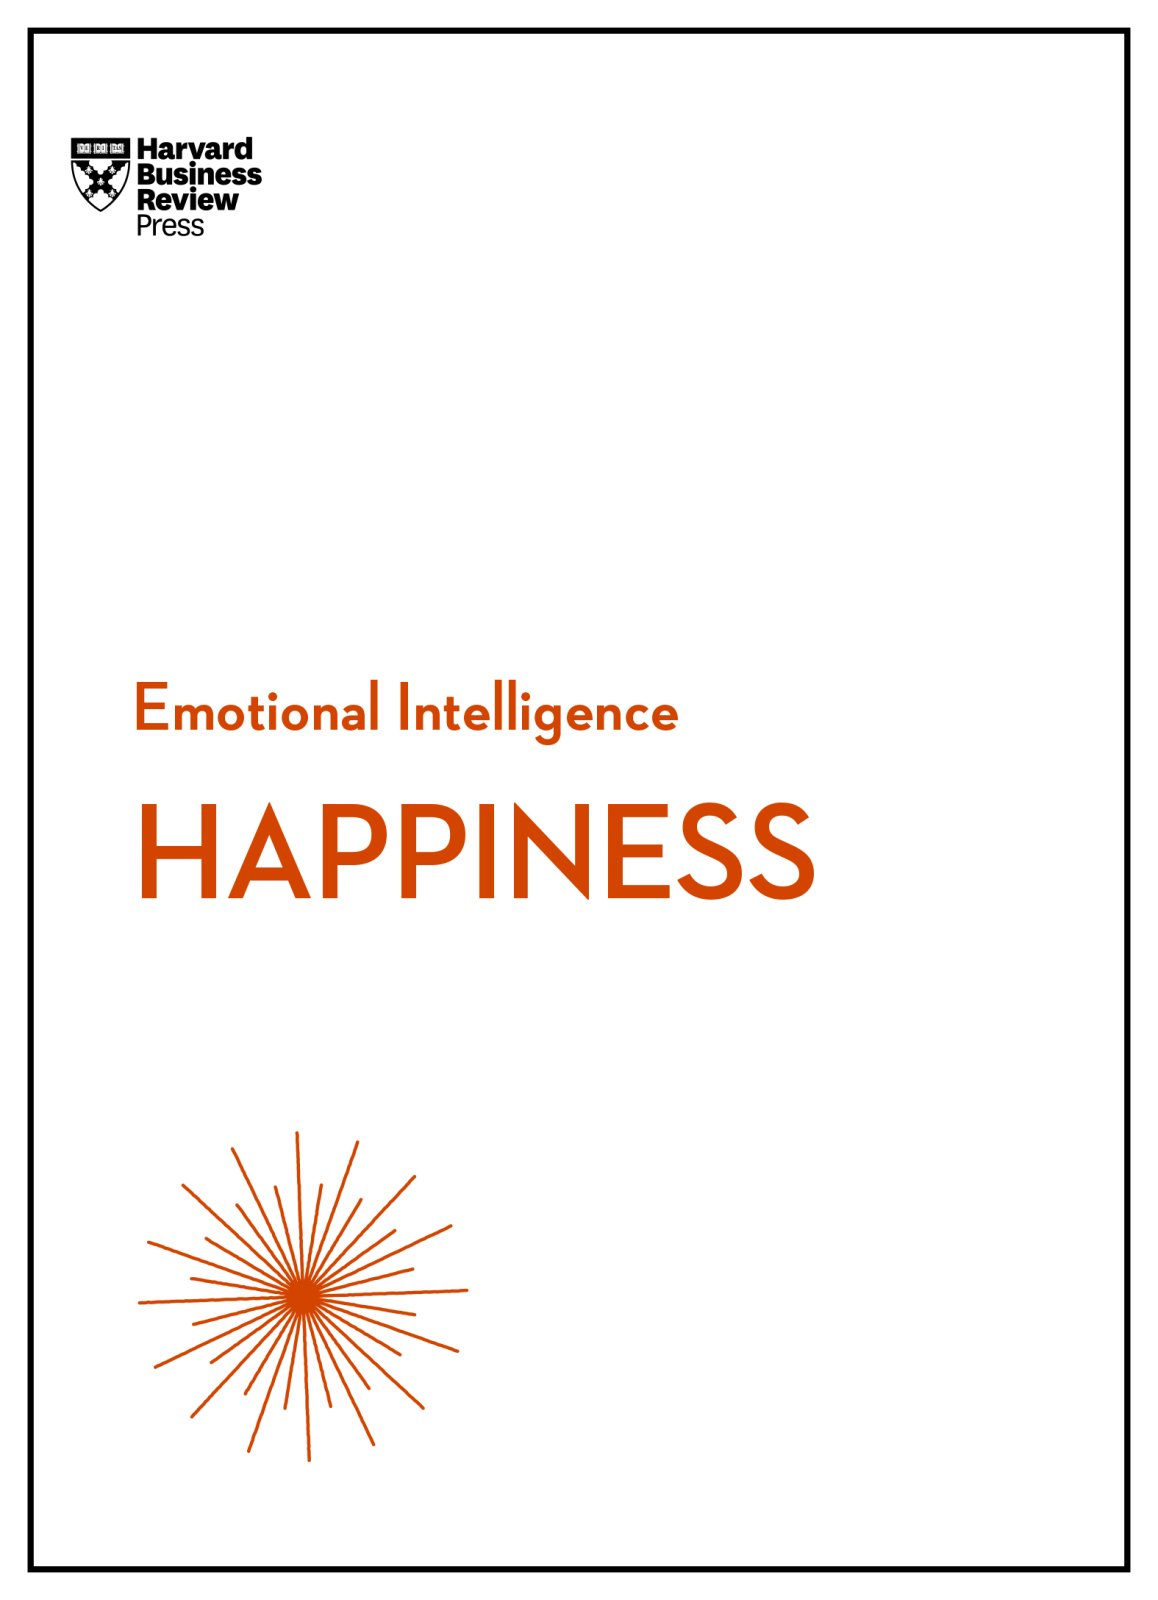 happiness hbr 2.jpg